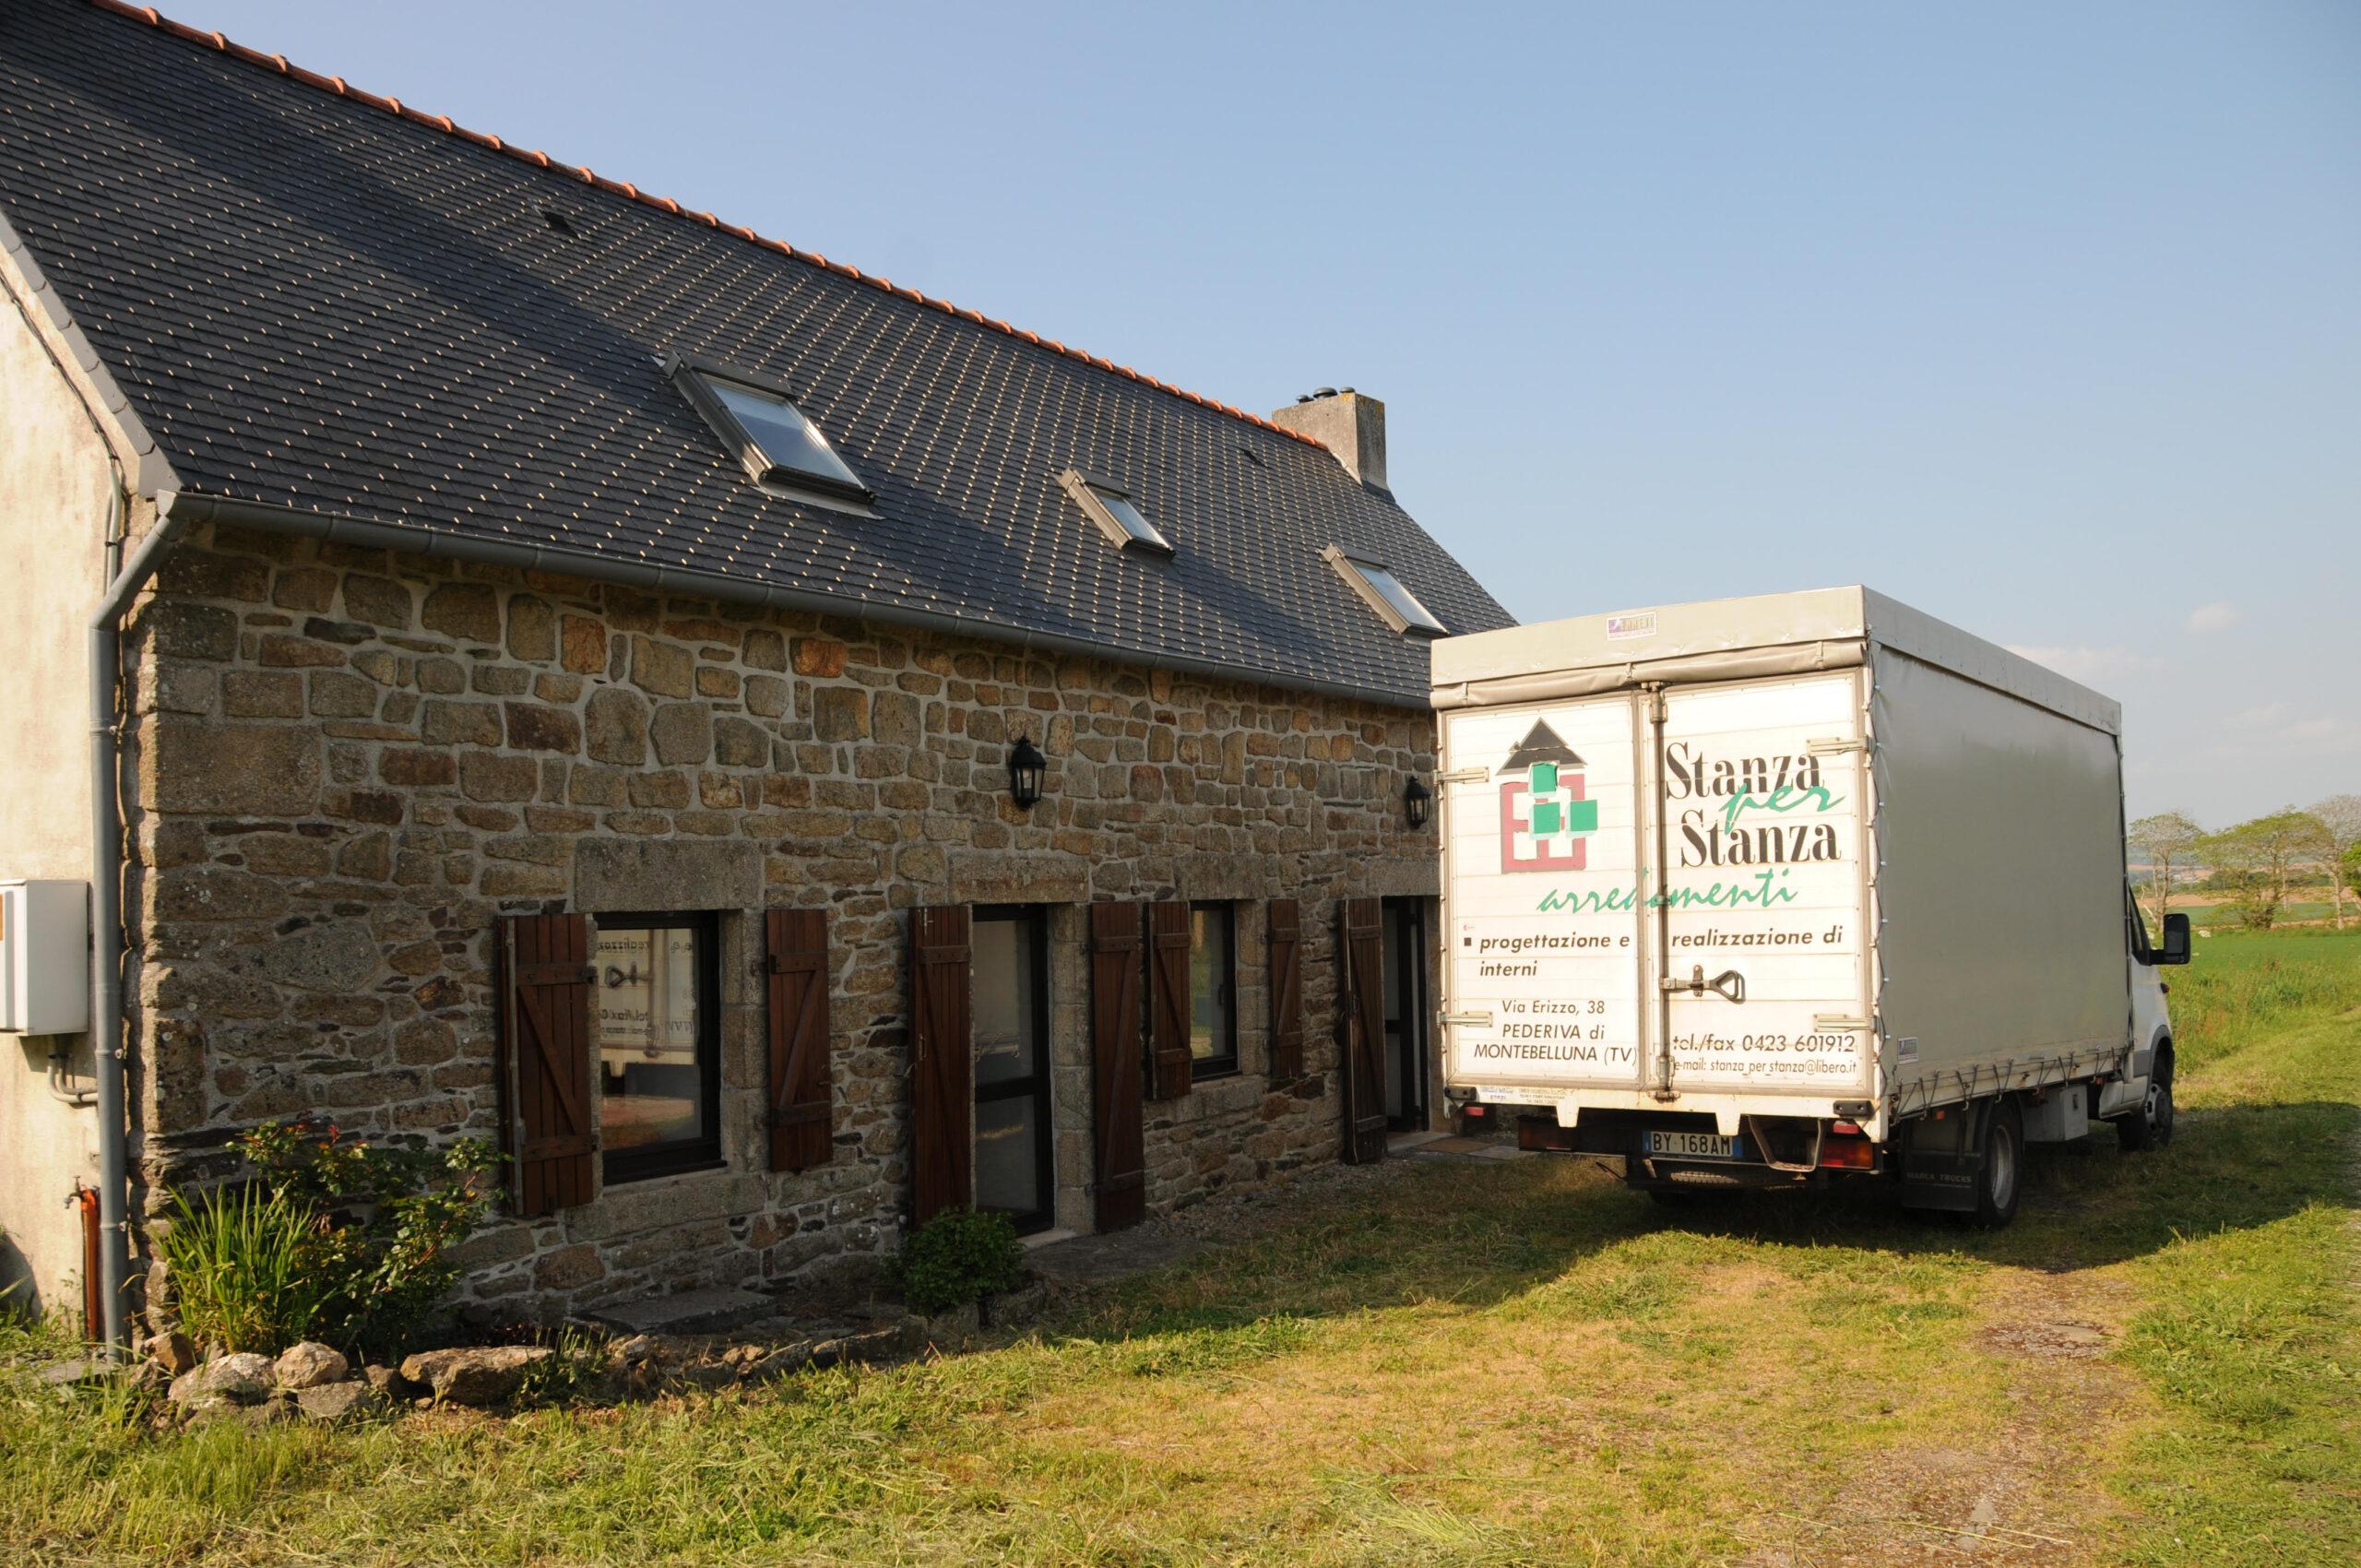 Stanza per Stanza Arredamenti di Vettoretti Mirco: cucina in Francia